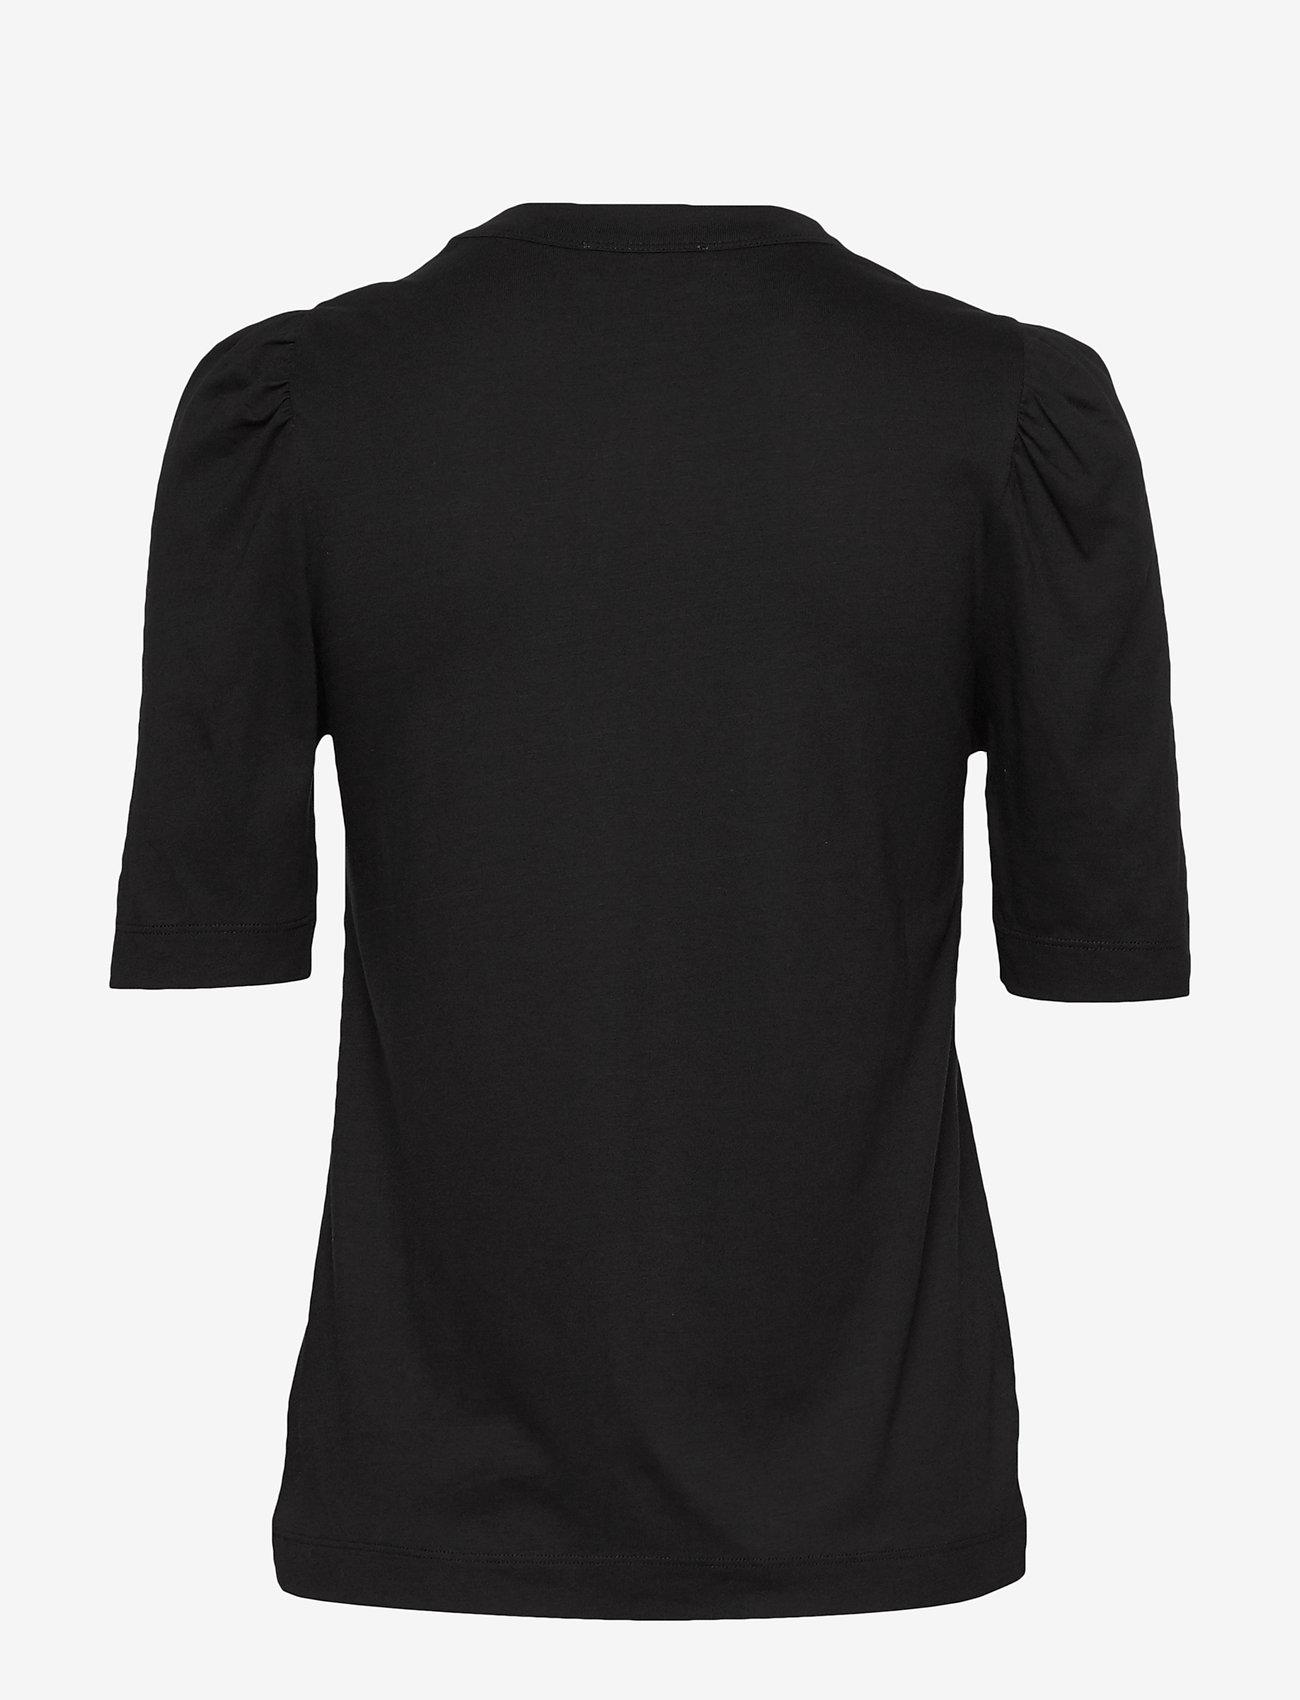 RODEBJER - RODEBJER DORY - t-shirts - black - 1